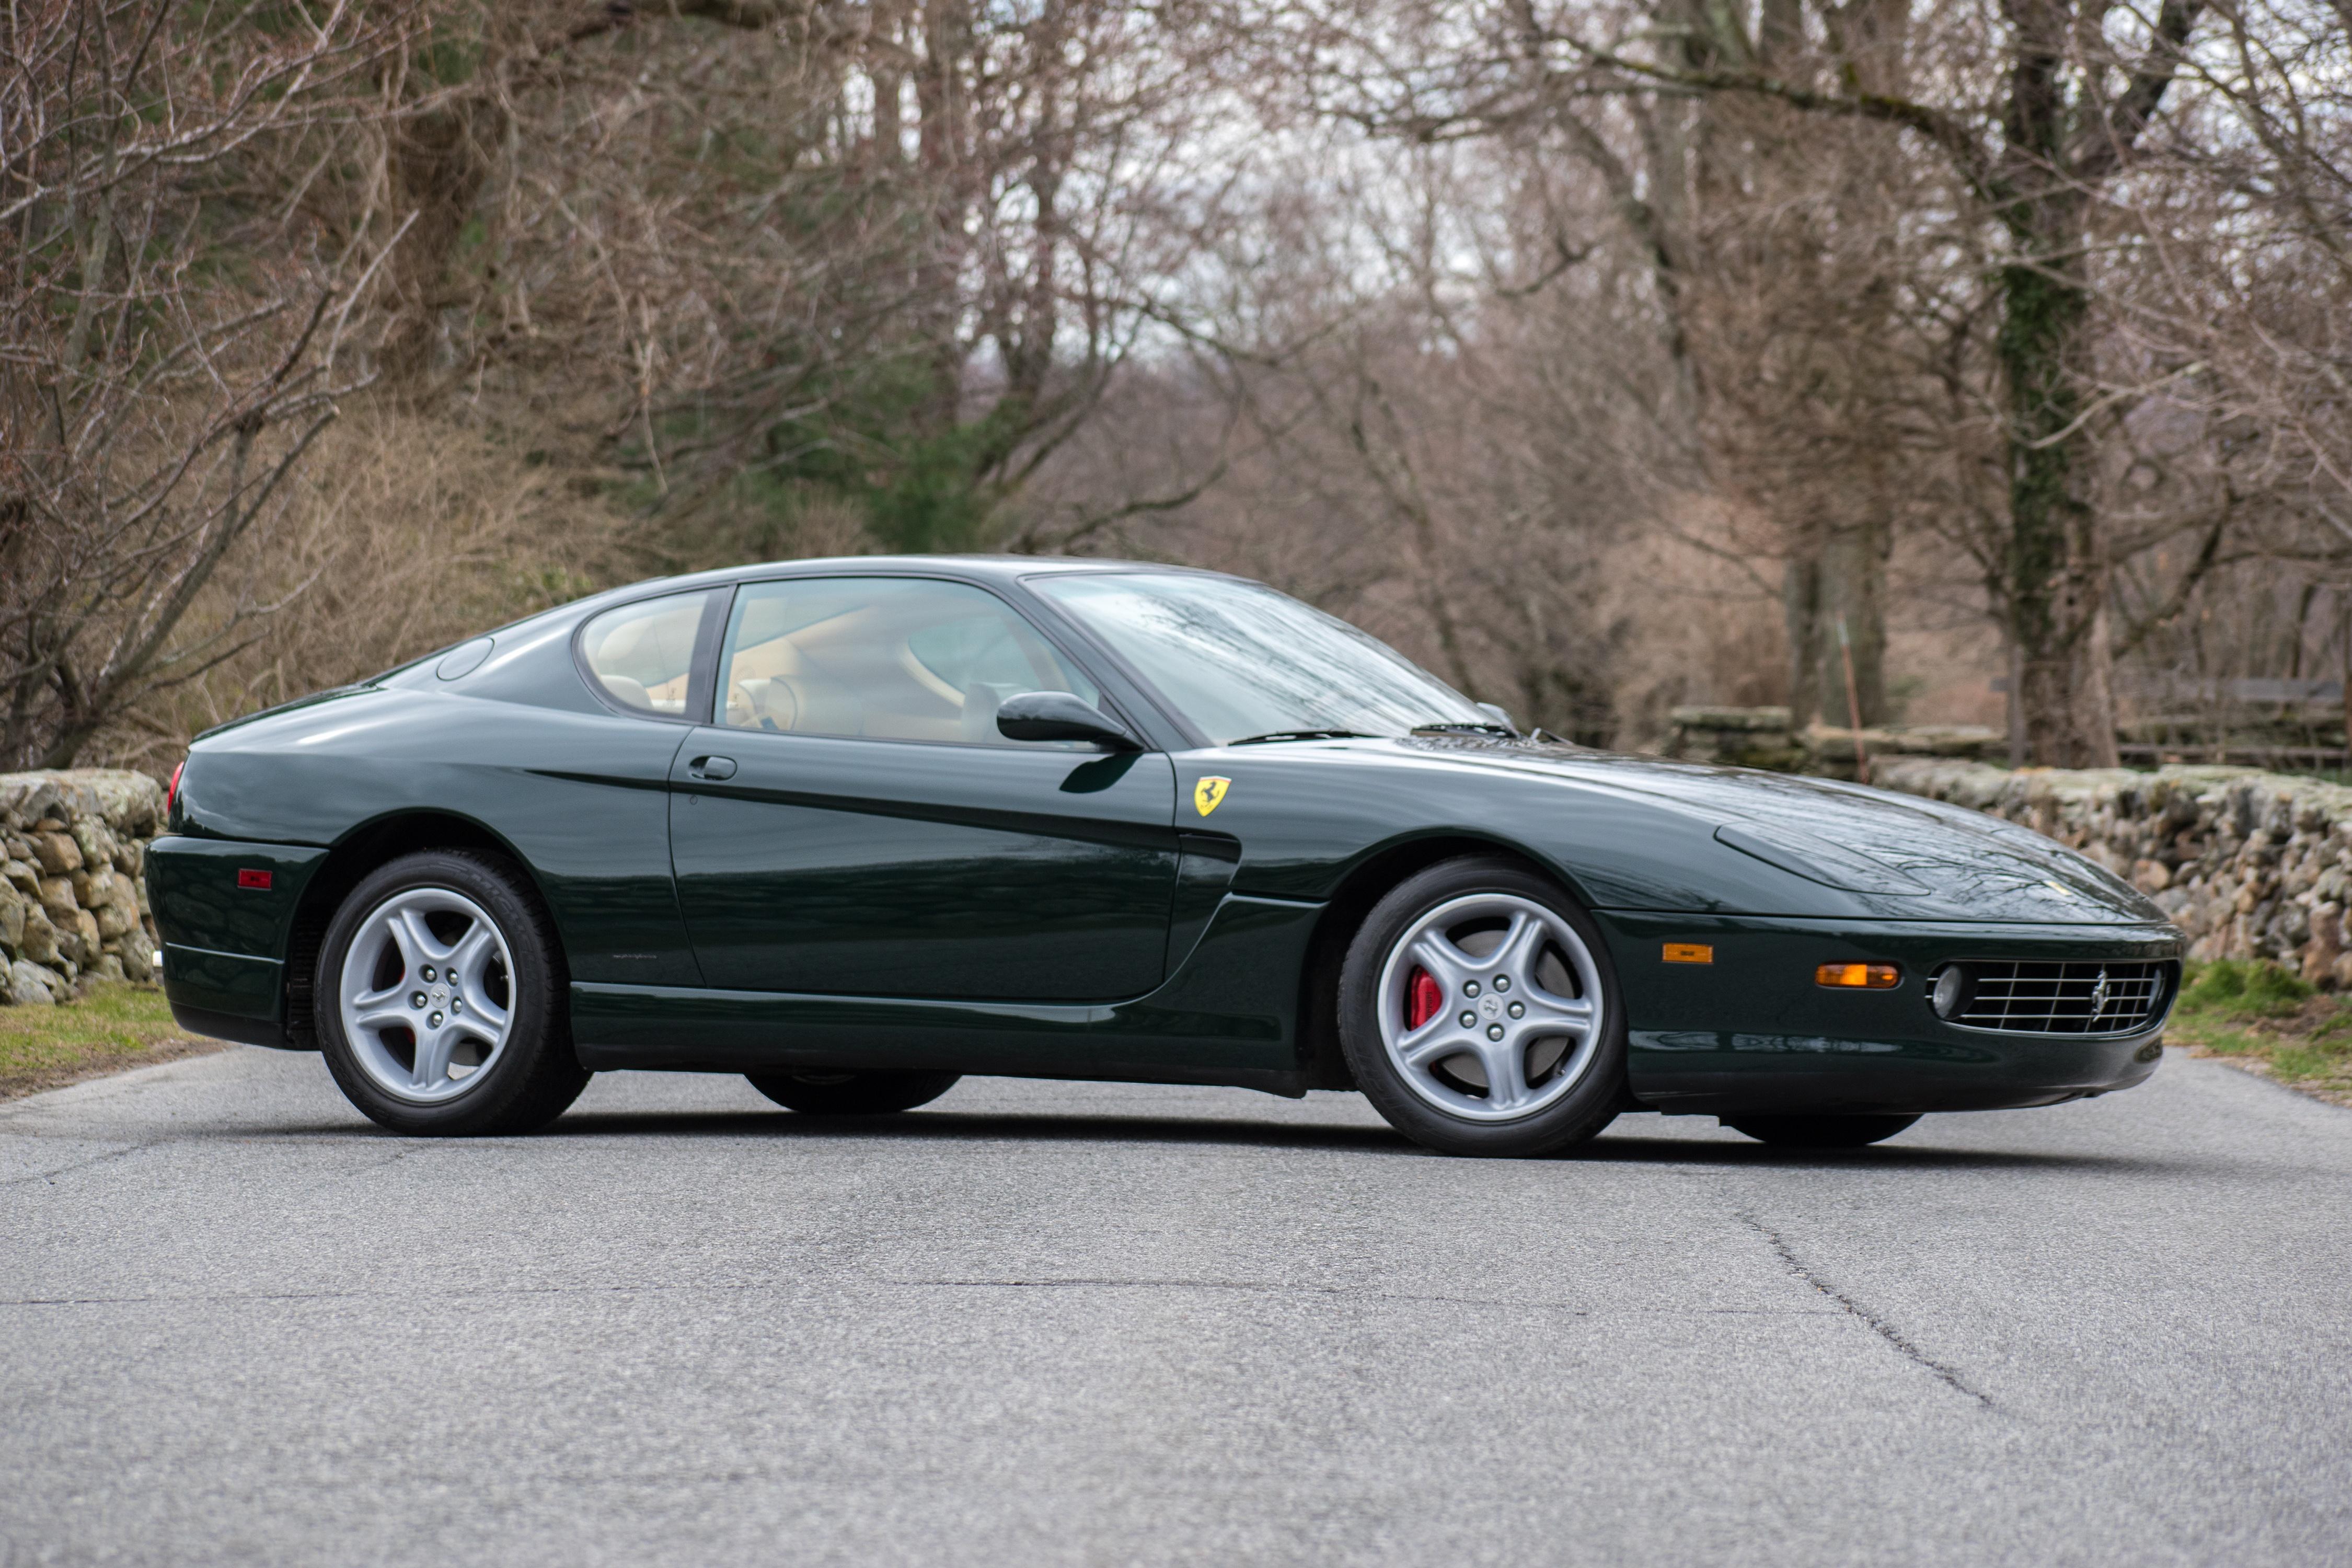 Ferrari 456 II (456M) 1998 - 2004 Coupe #5